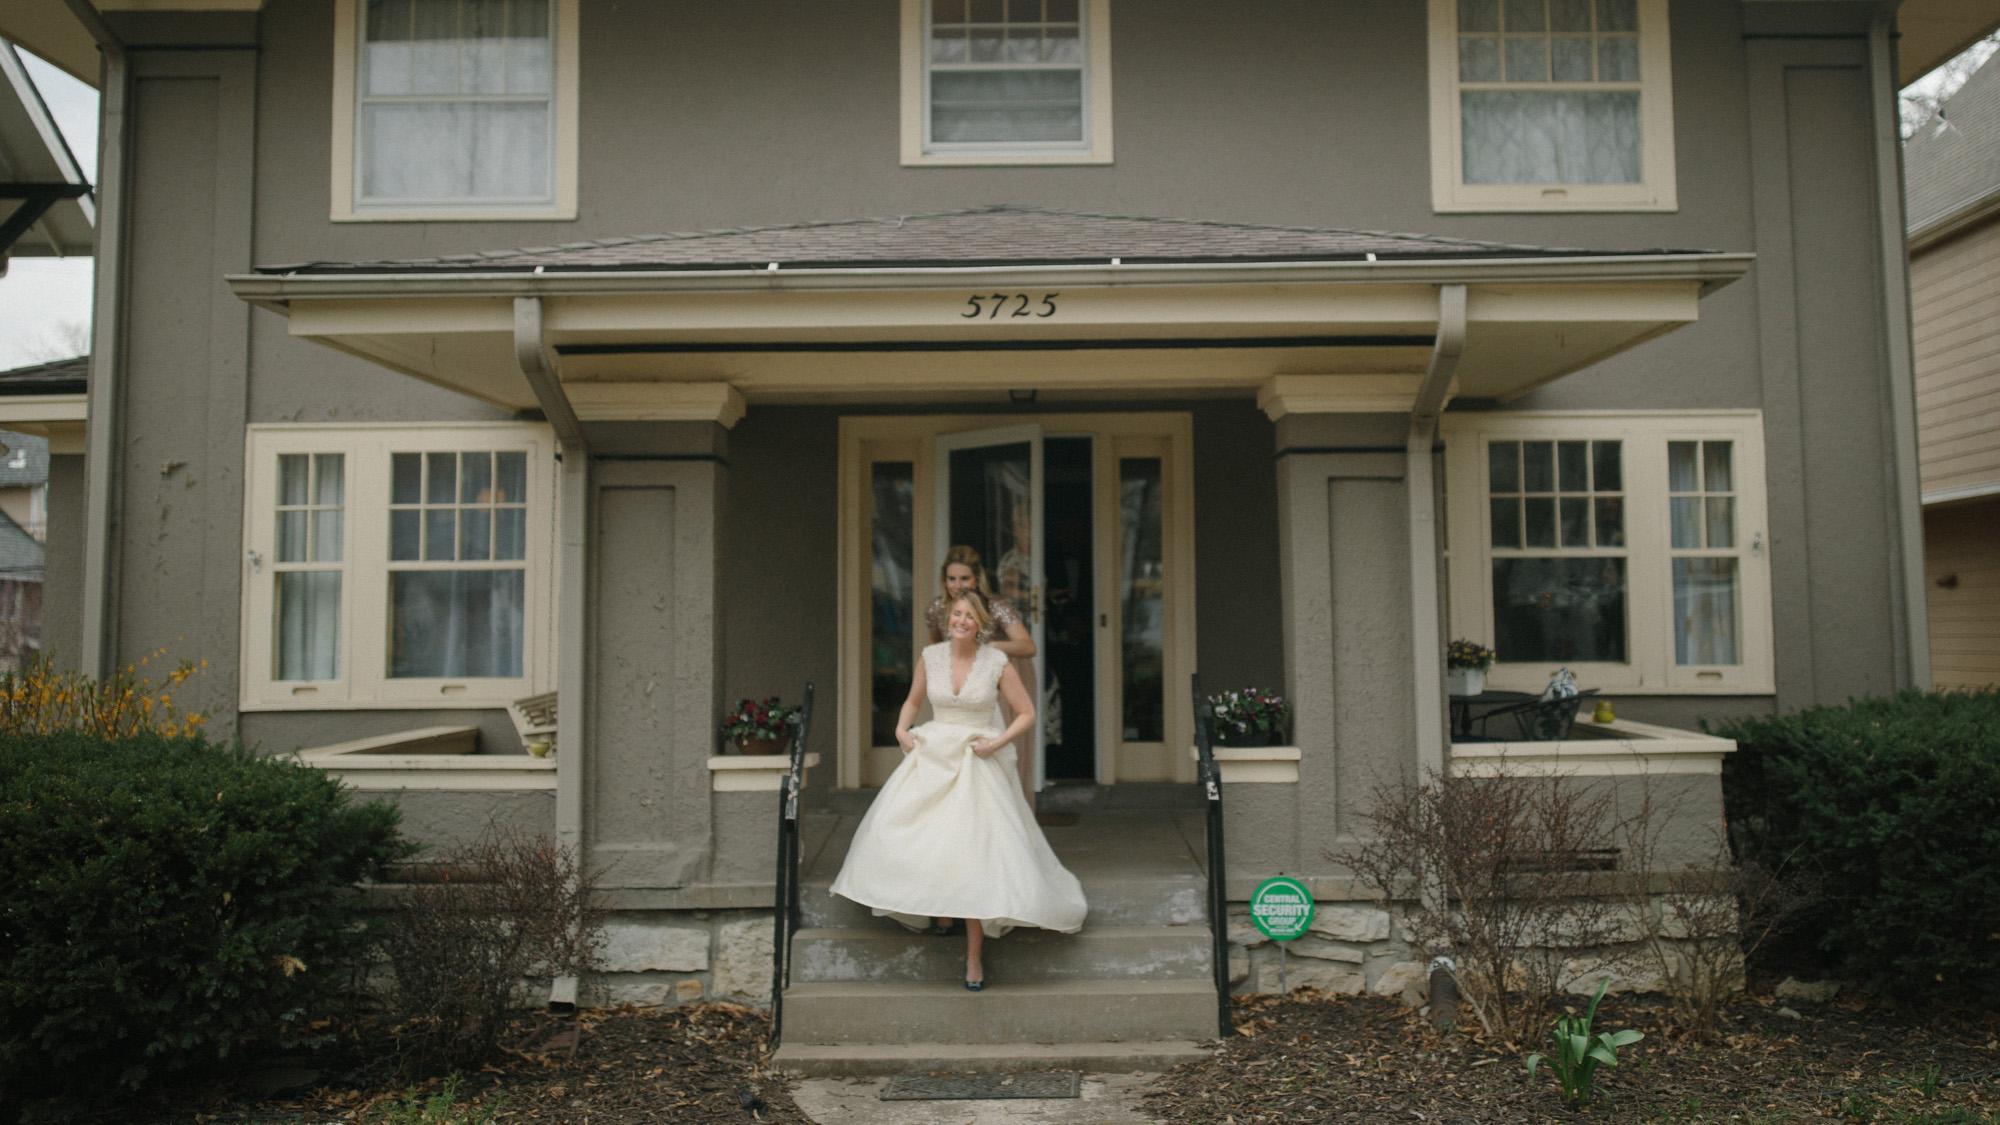 Alec_Vanderboom_kansas_city_hip_wedding_photos-0023.jpg